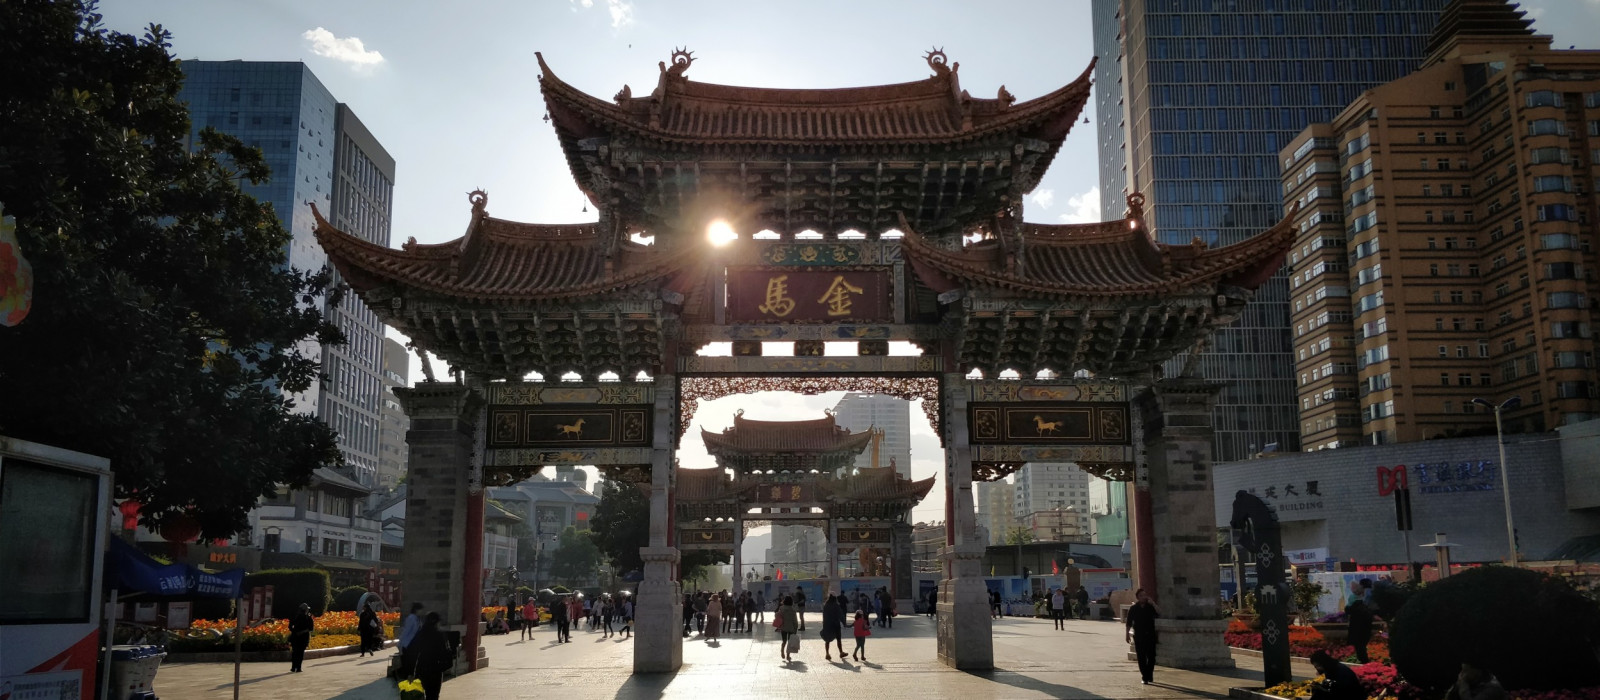 Reiseziel Kunming China